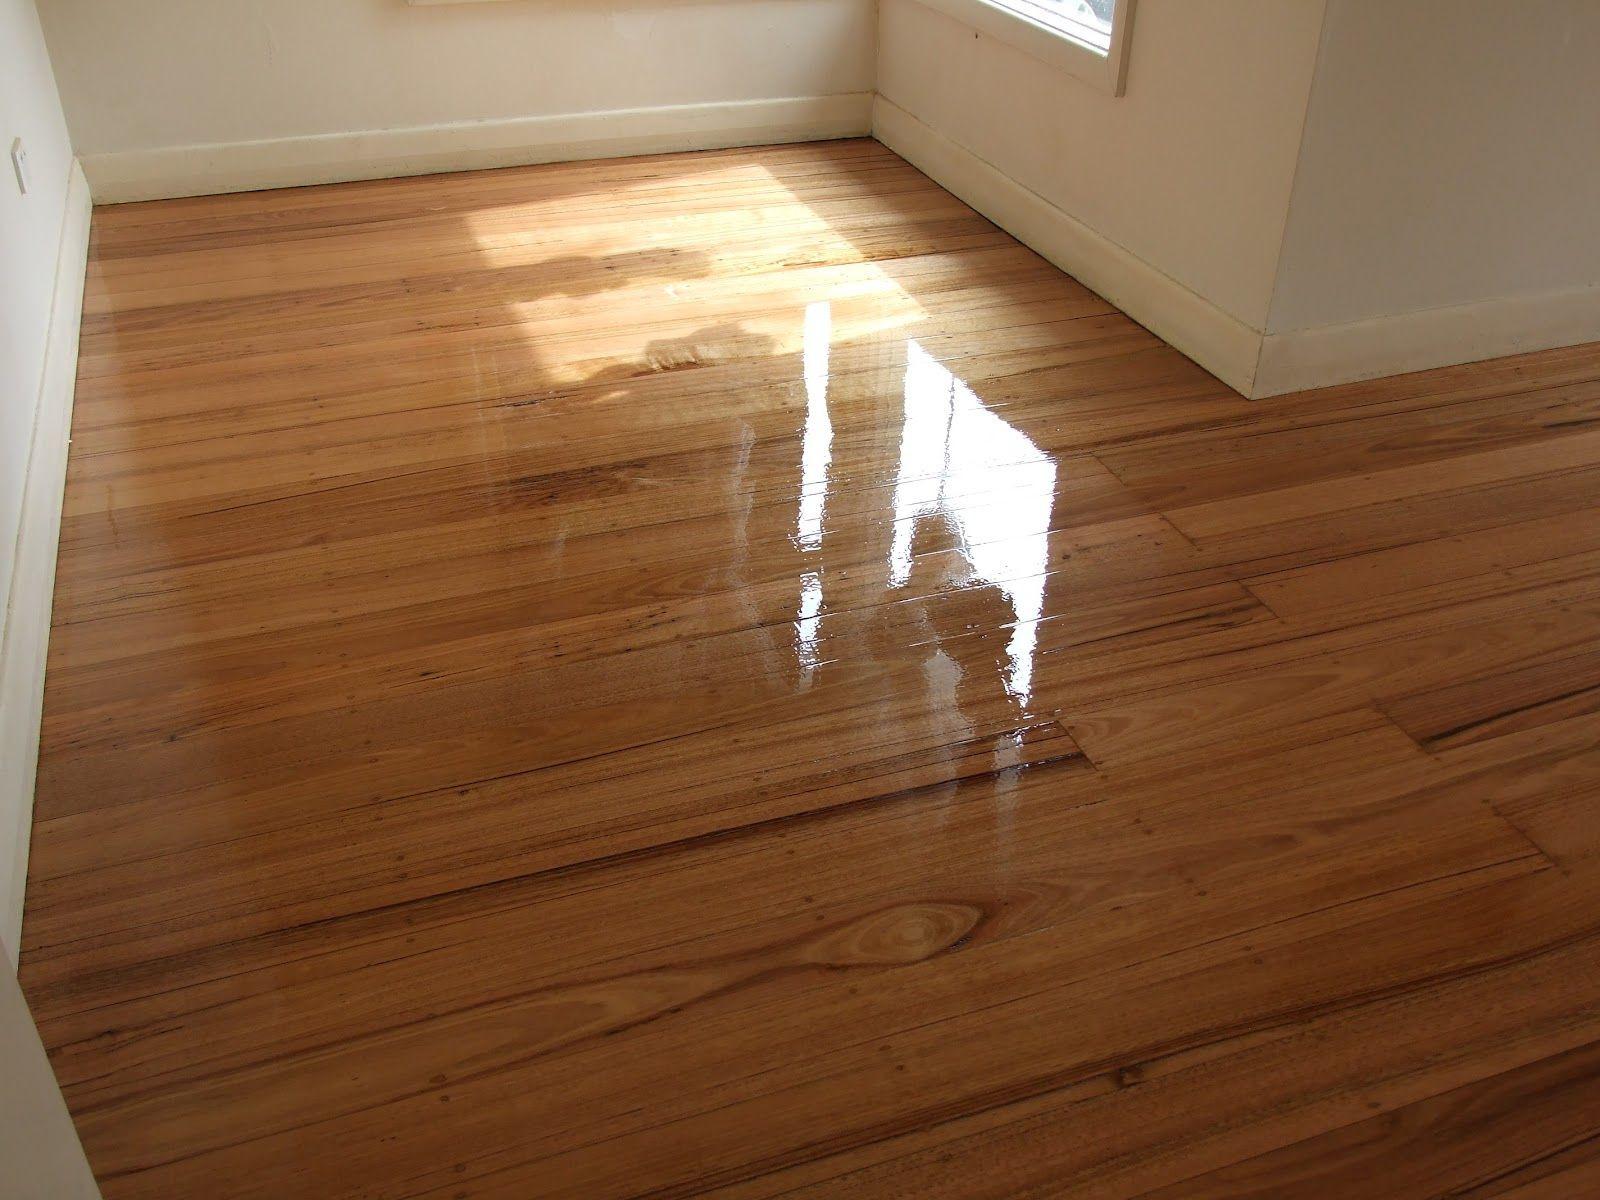 pb hardwood floor cleaner of the wooden floor best laminate wood flooring unique woodfloor in 0d beautiful the wooden floor pro tect s finished floor guard is quickly be ing one of the